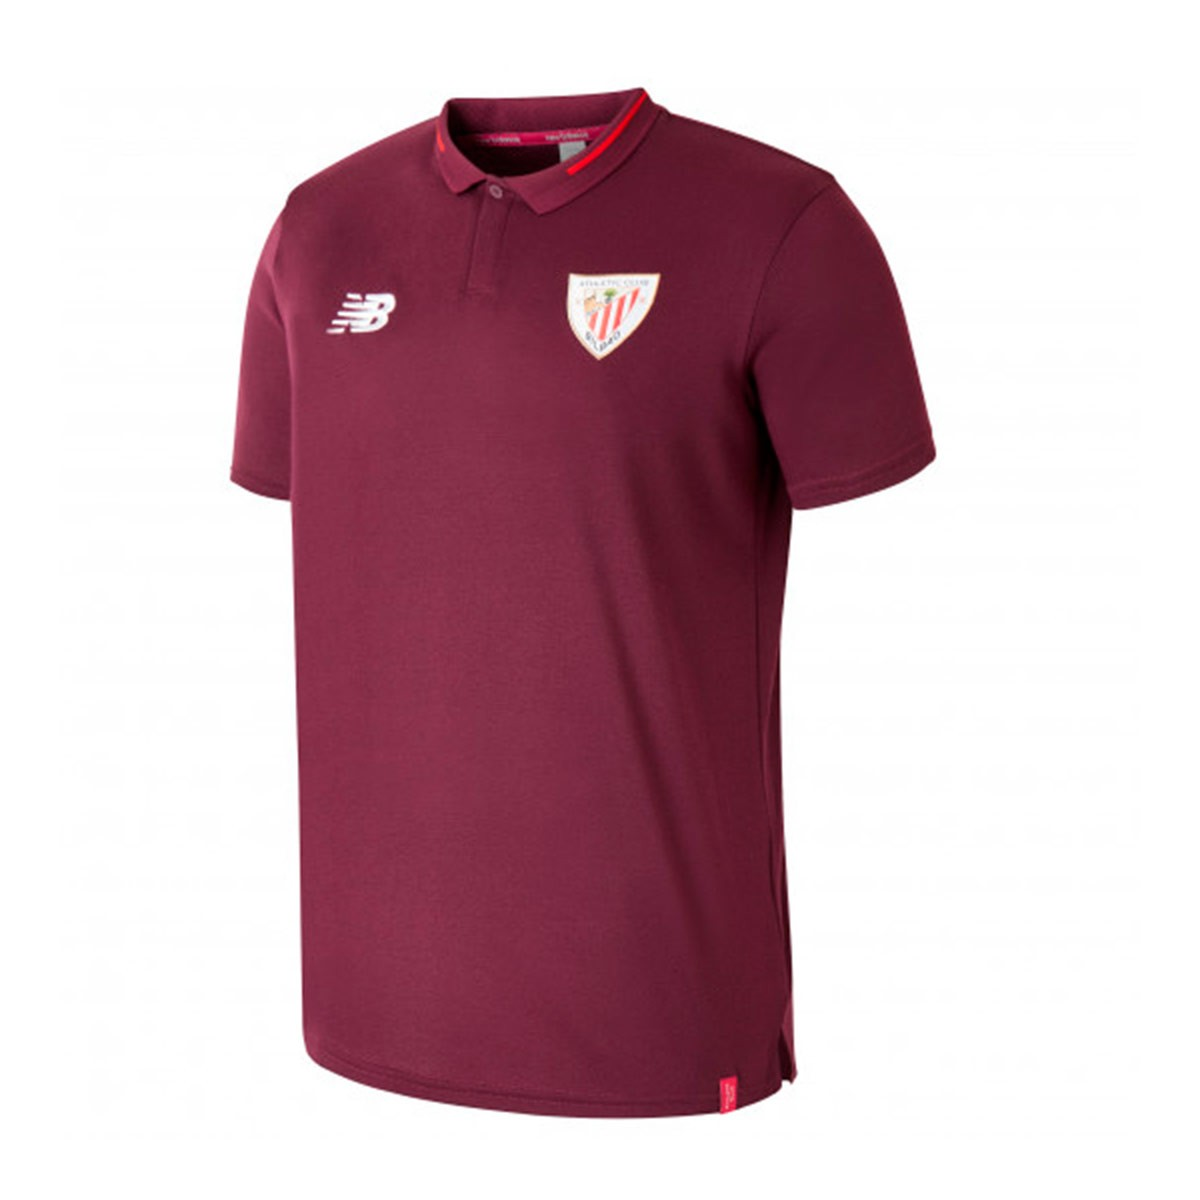 5c2dd76765a0b Polo shirt New Balance AC Bilbao Essentials 2018-2019 Garnet ...